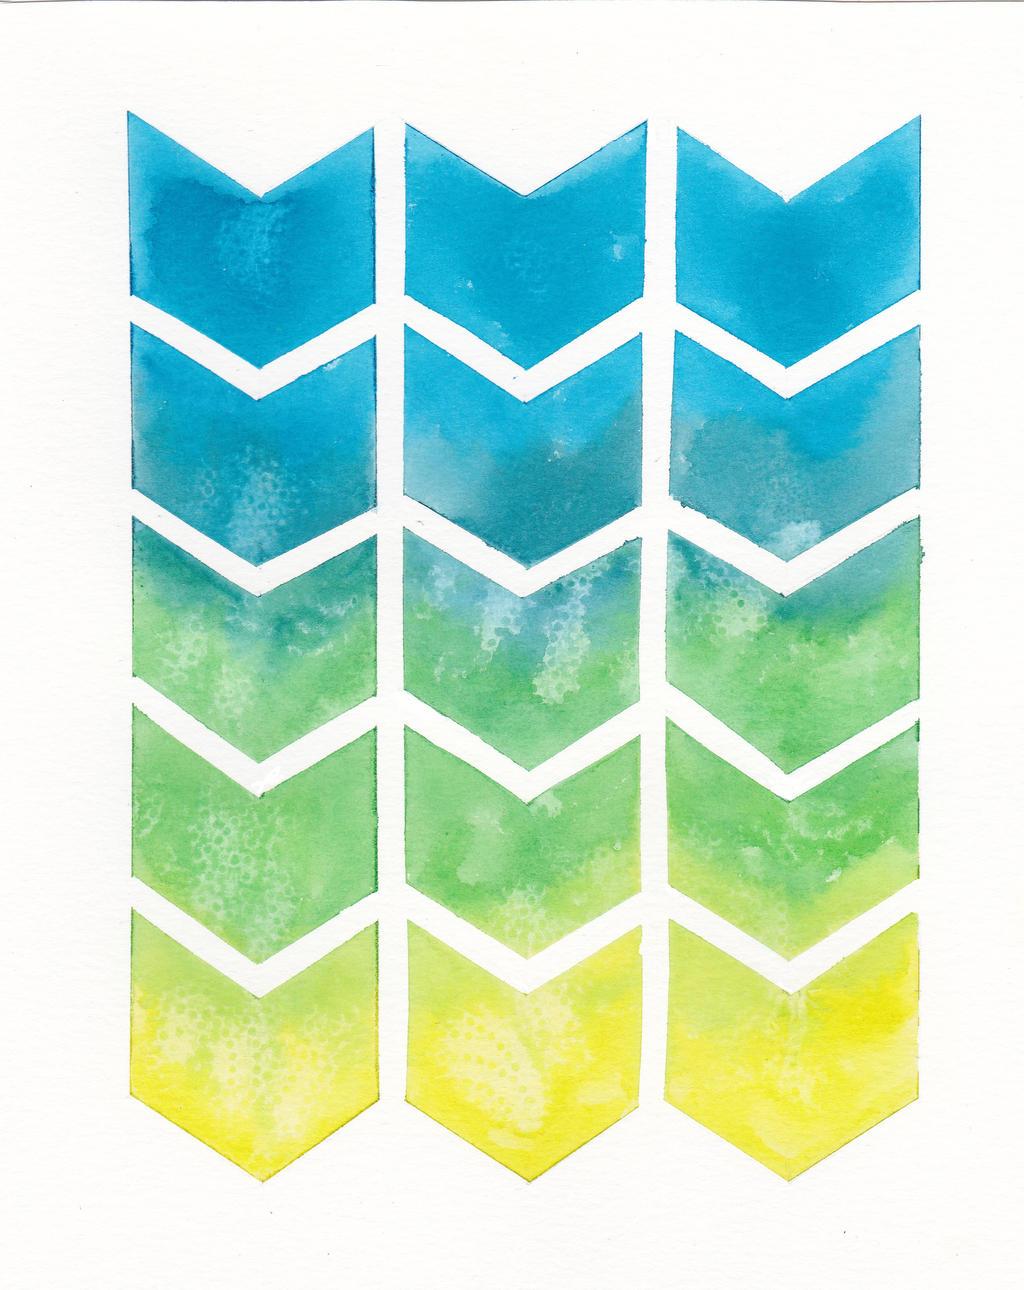 Blue ombre chevron pattern - photo#1